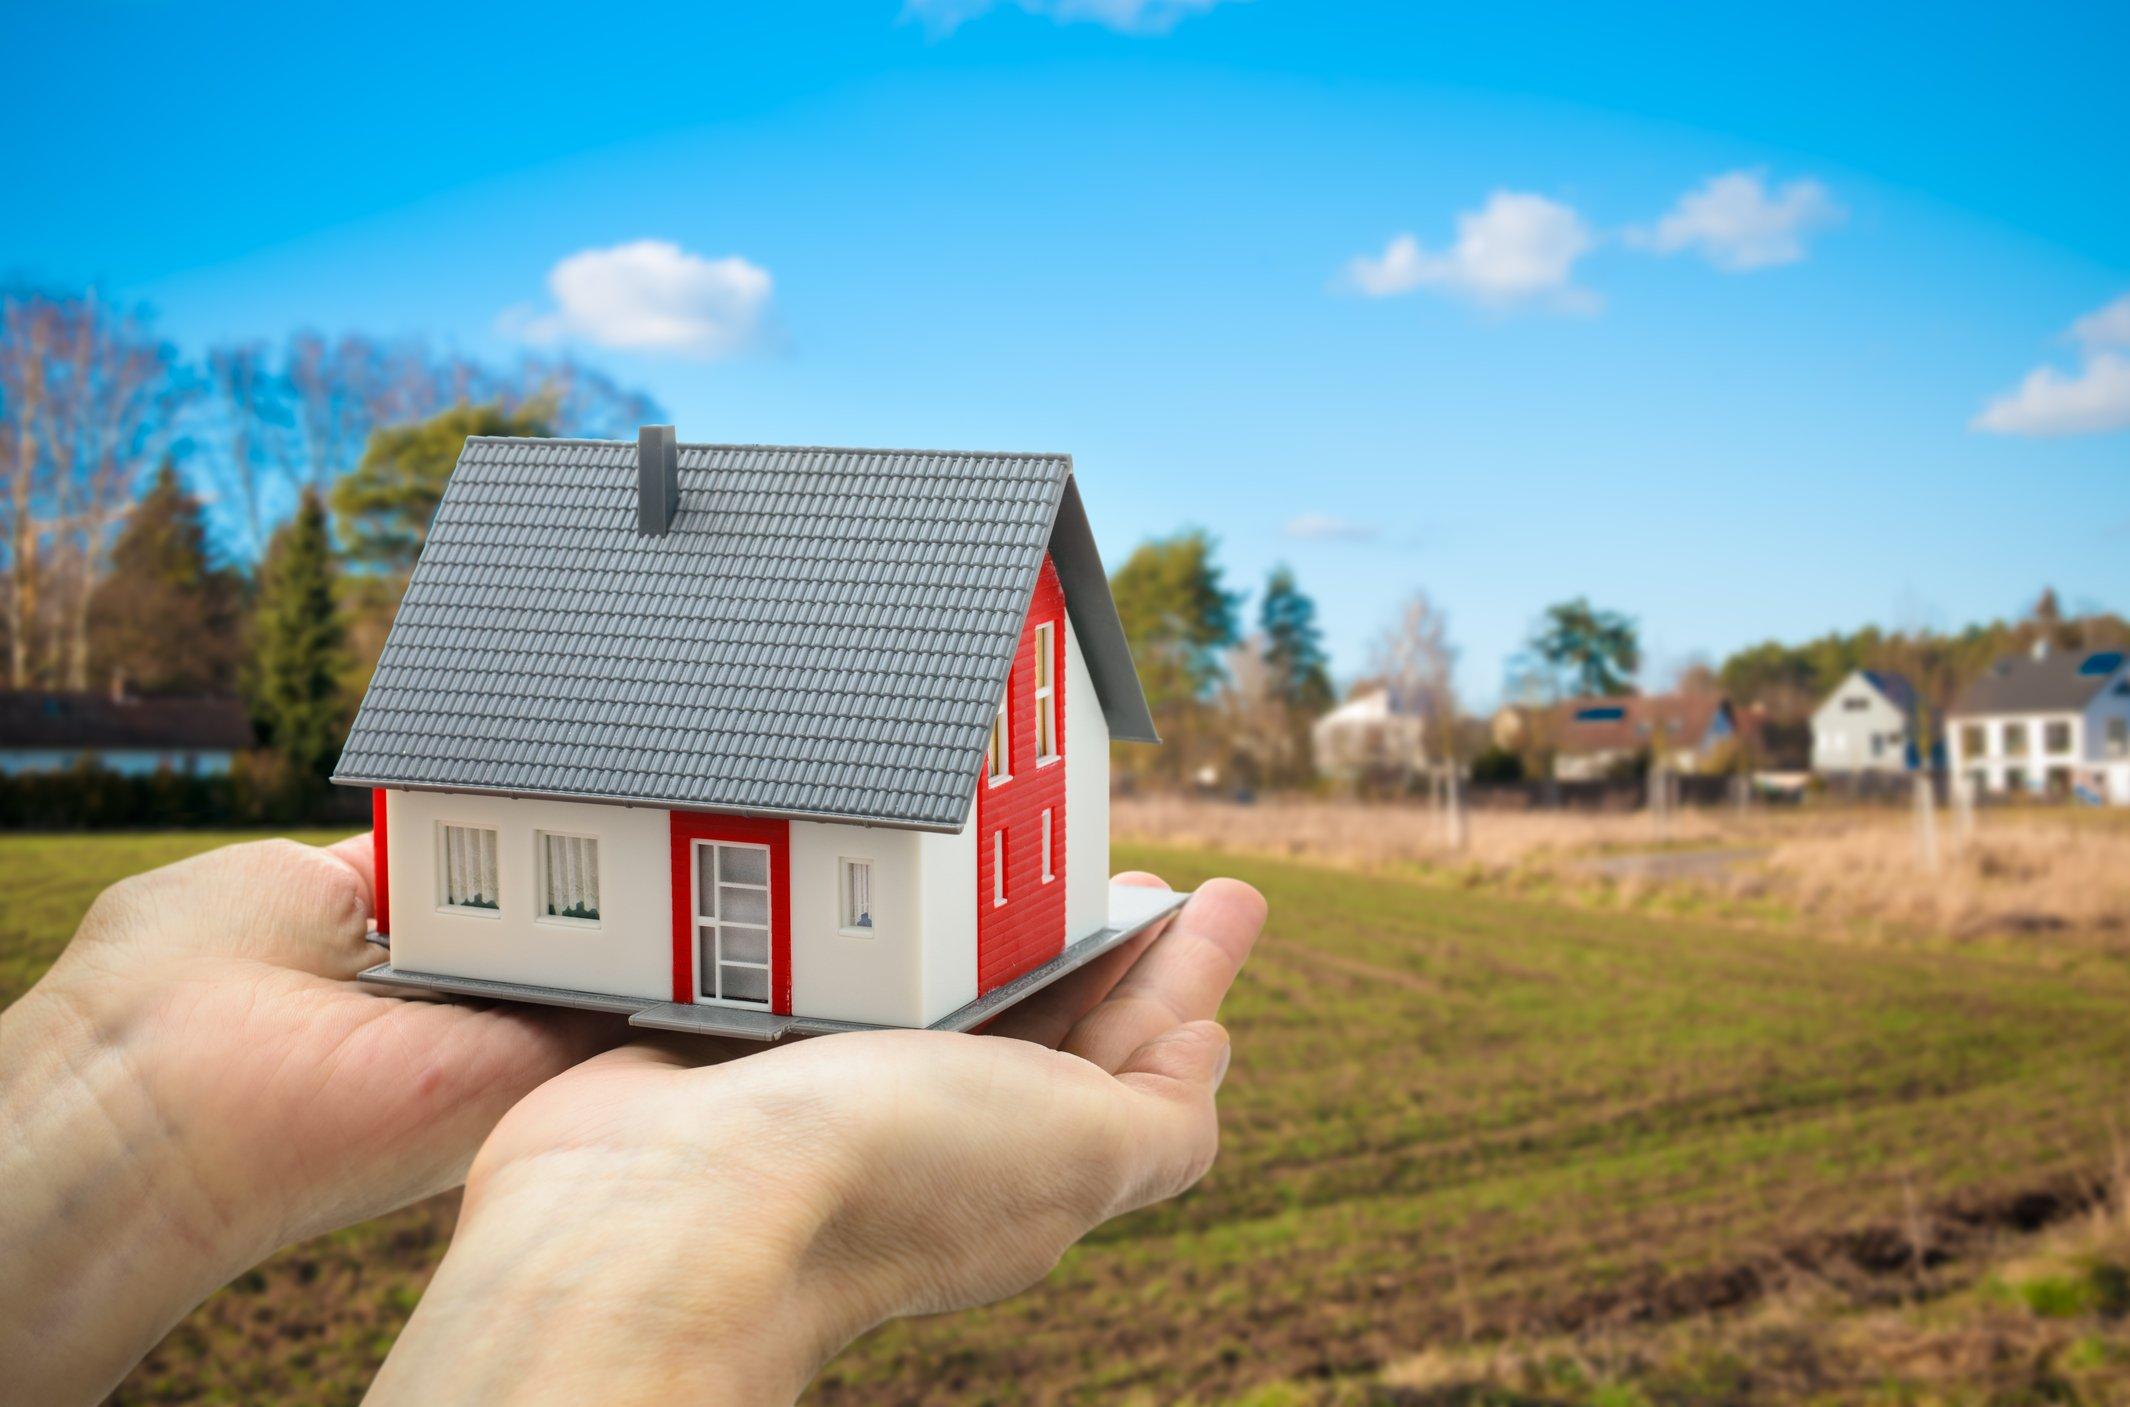 залог земельных участков предприятий зданий сооружений квартир